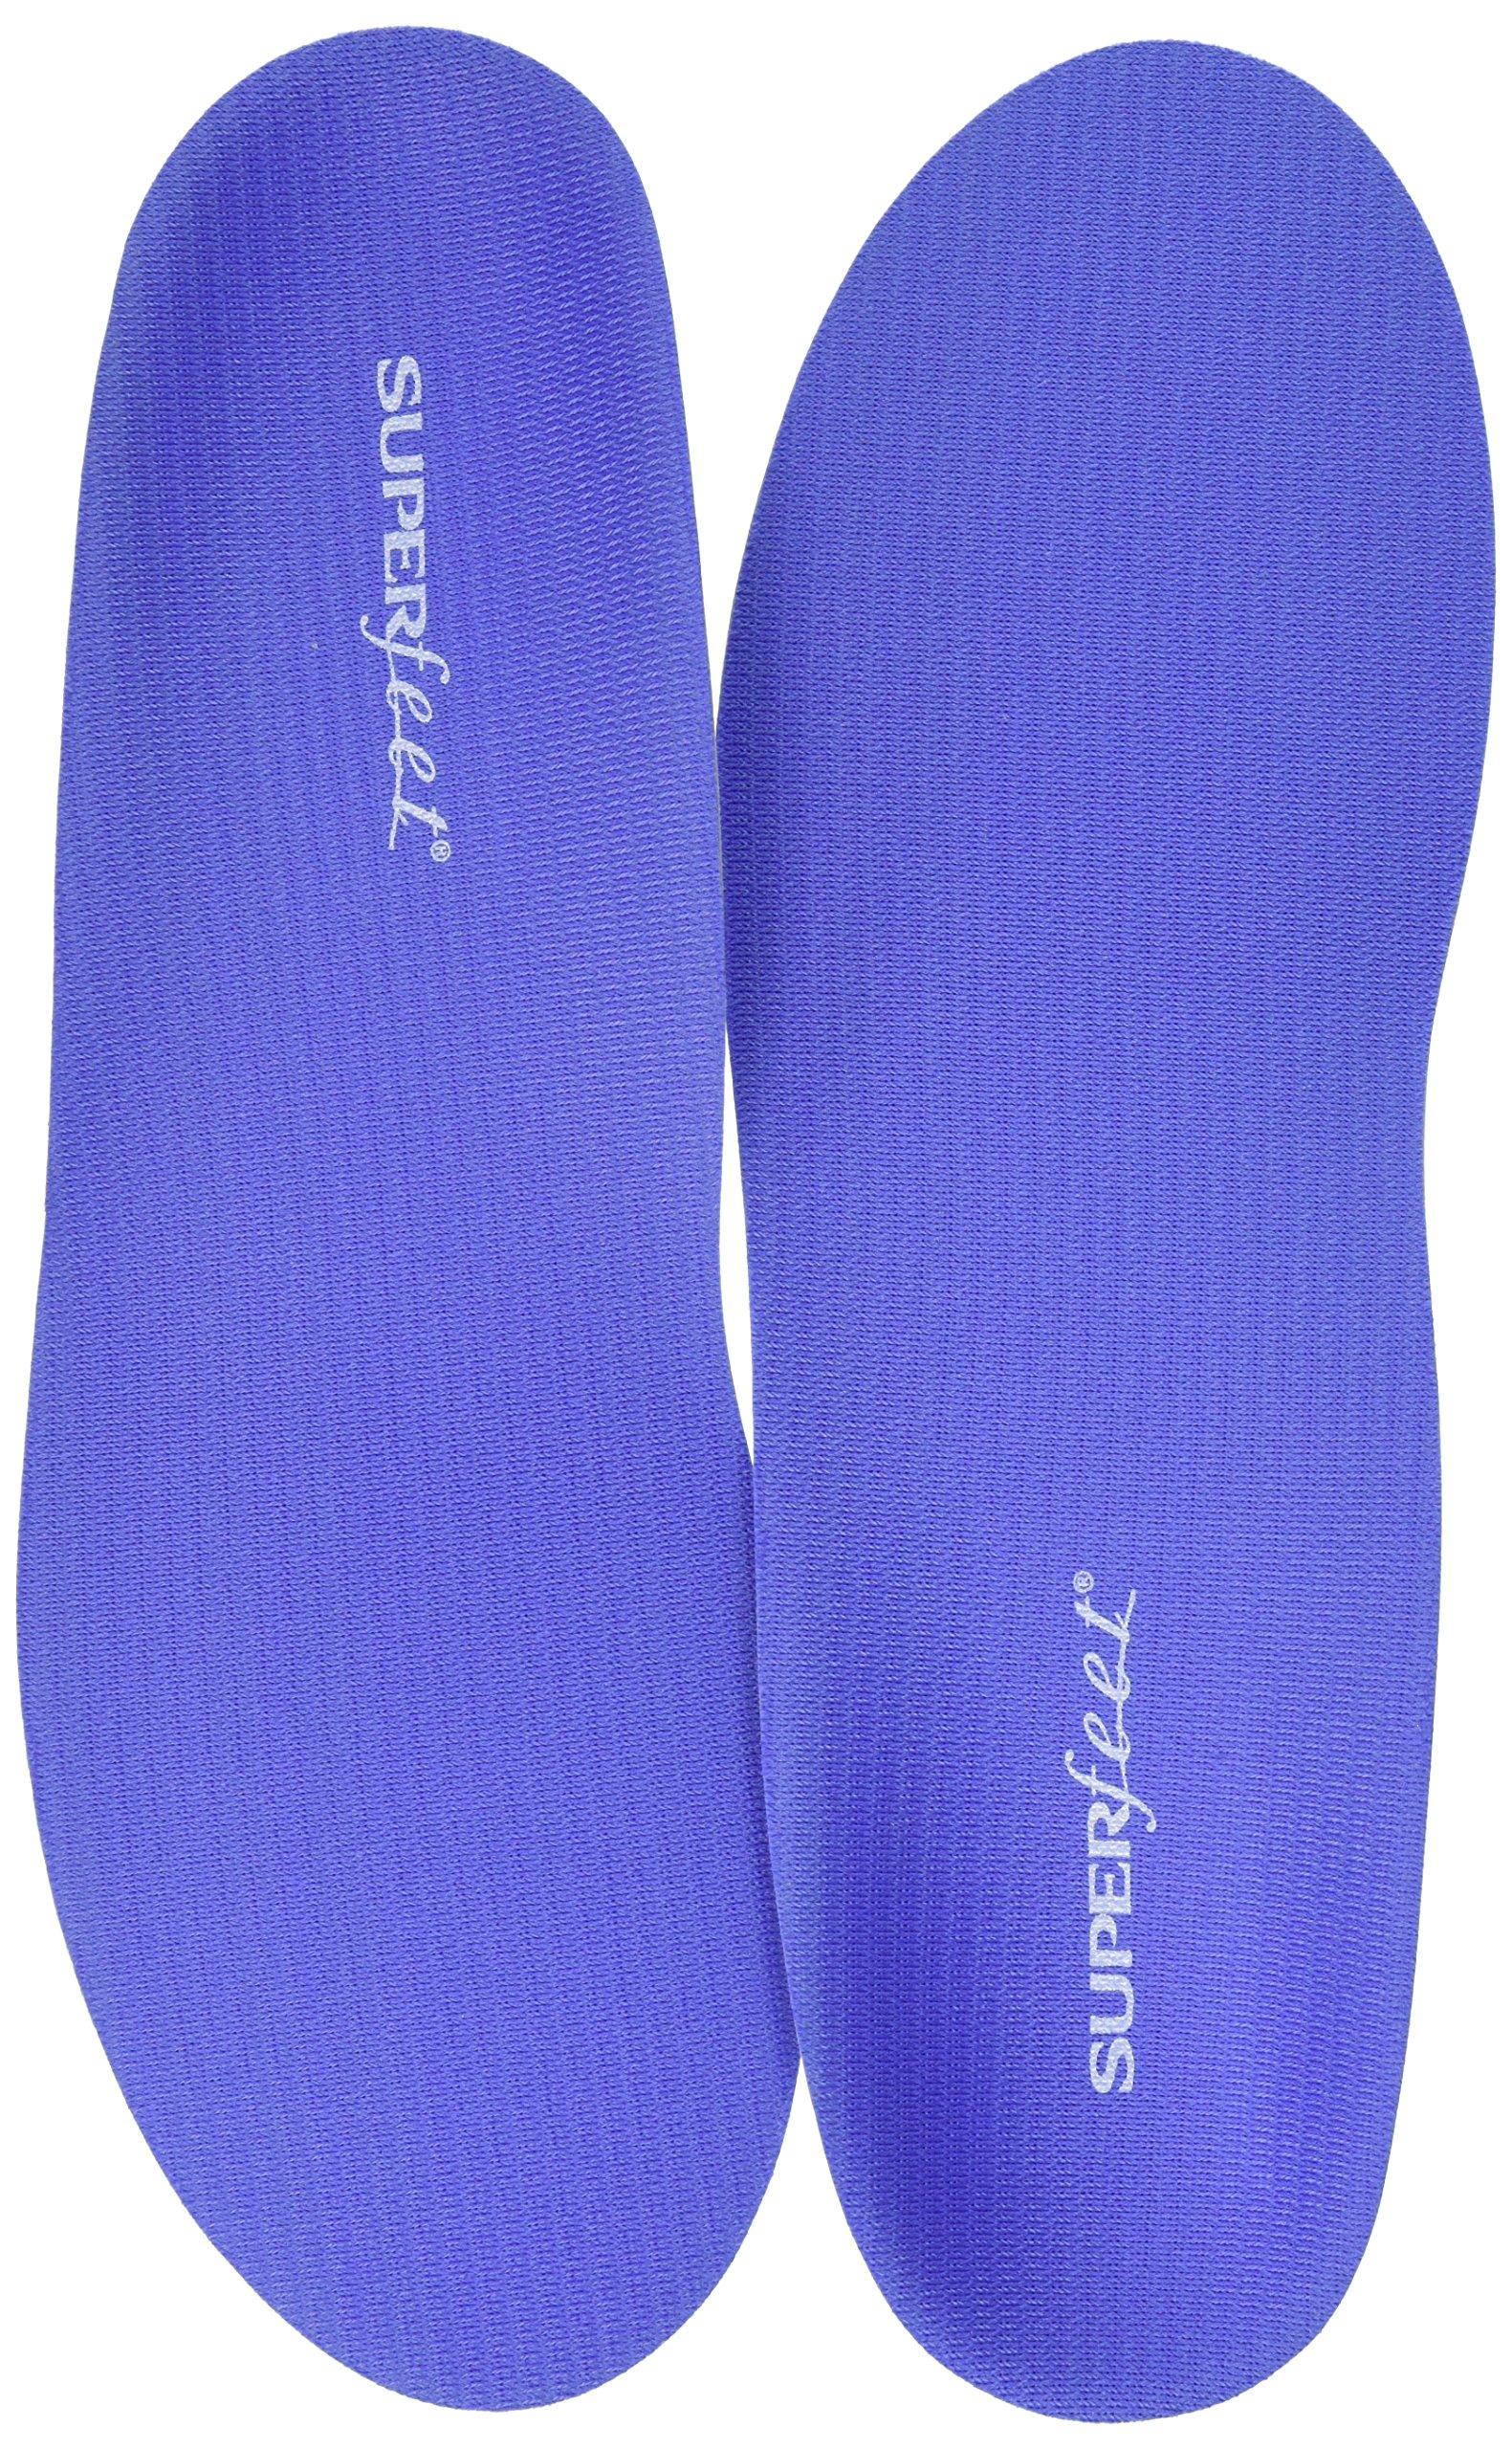 Superfeet Women's Comfort Shoe Insoles, Blueberry, Large/8.5-10 US M US